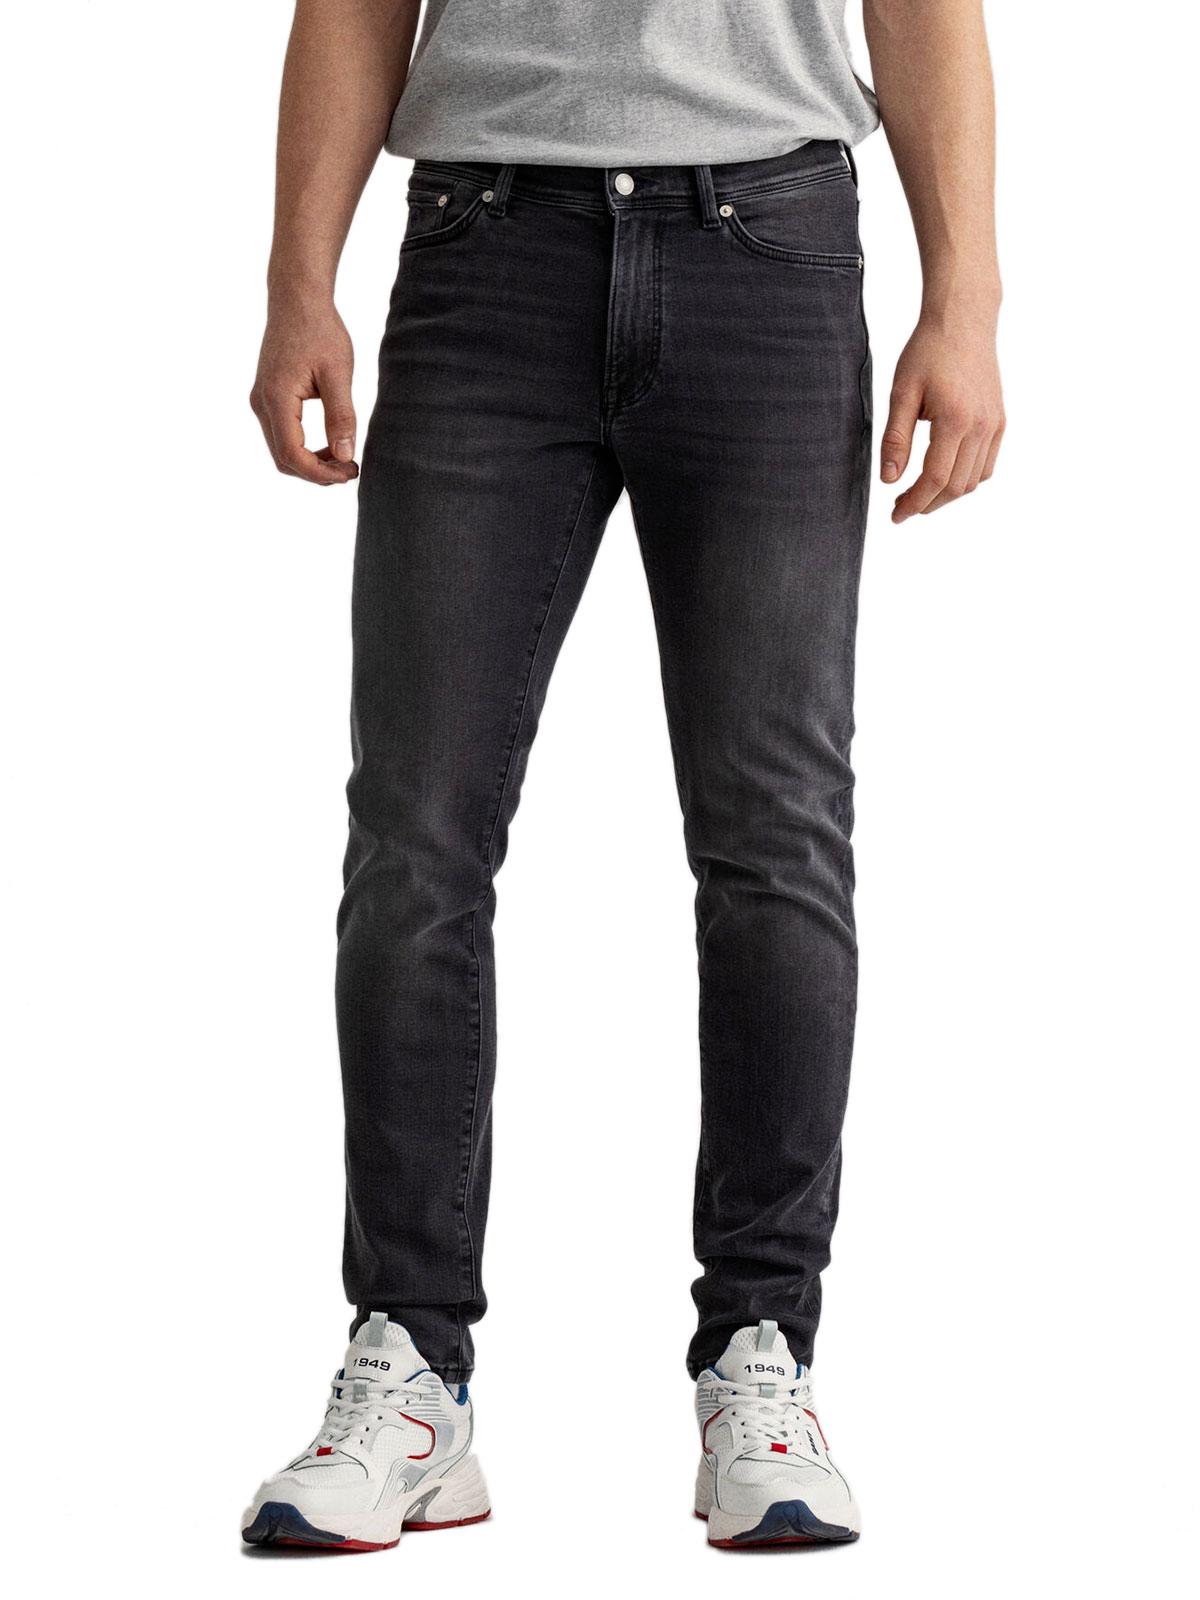 Picture of Gant | Jeans D1. Maxen Active-Recover Blk Jeans